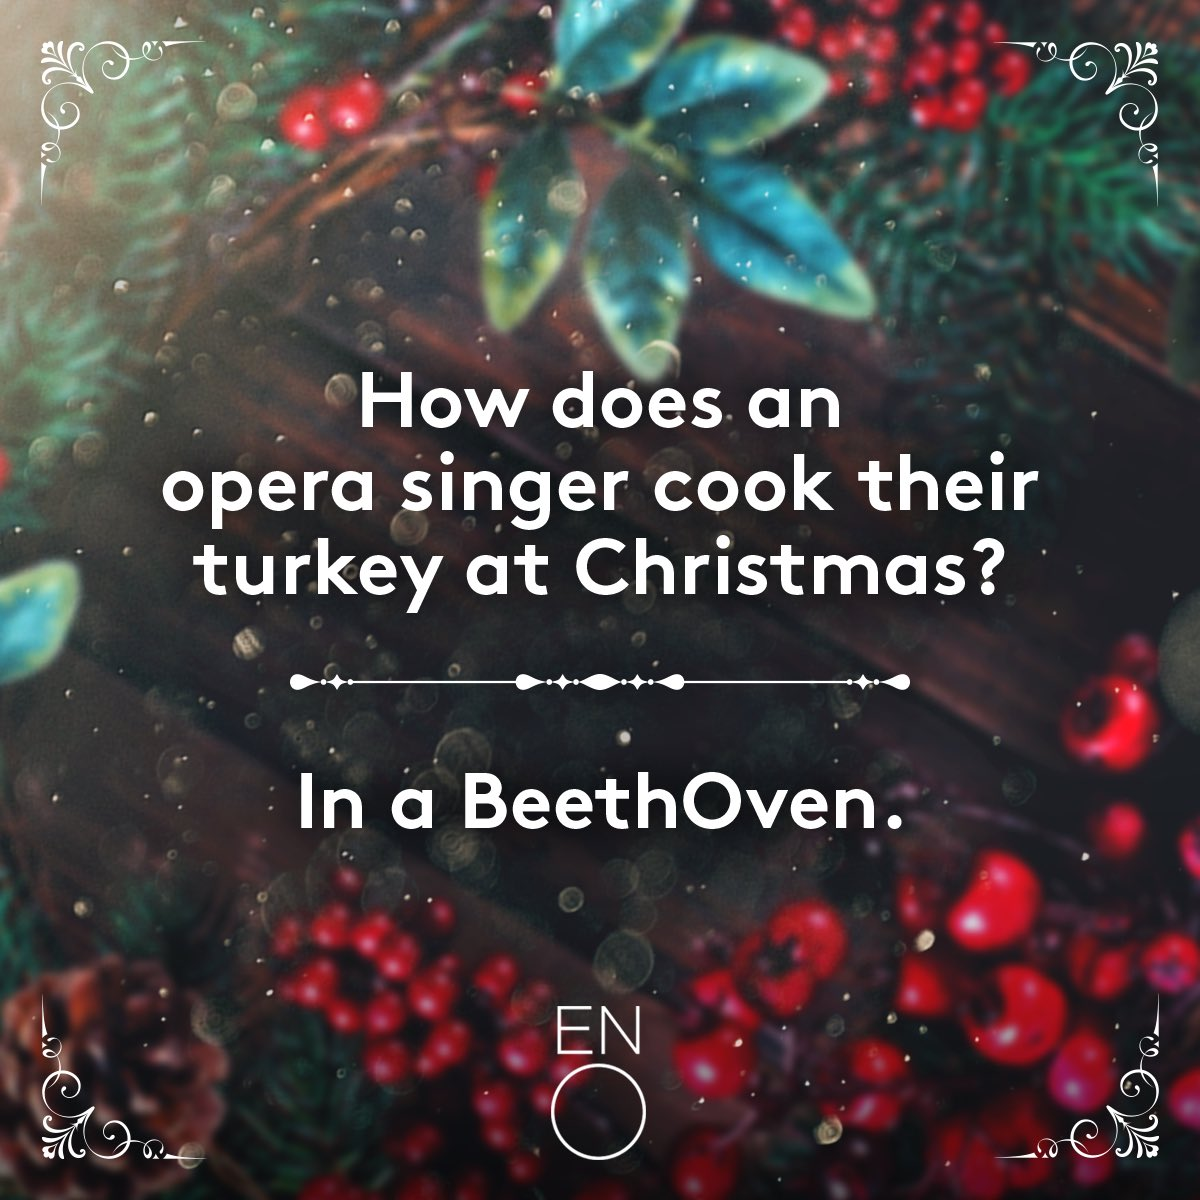 Bad Christmas Jokes.English National Opera On Twitter The Bad Musical